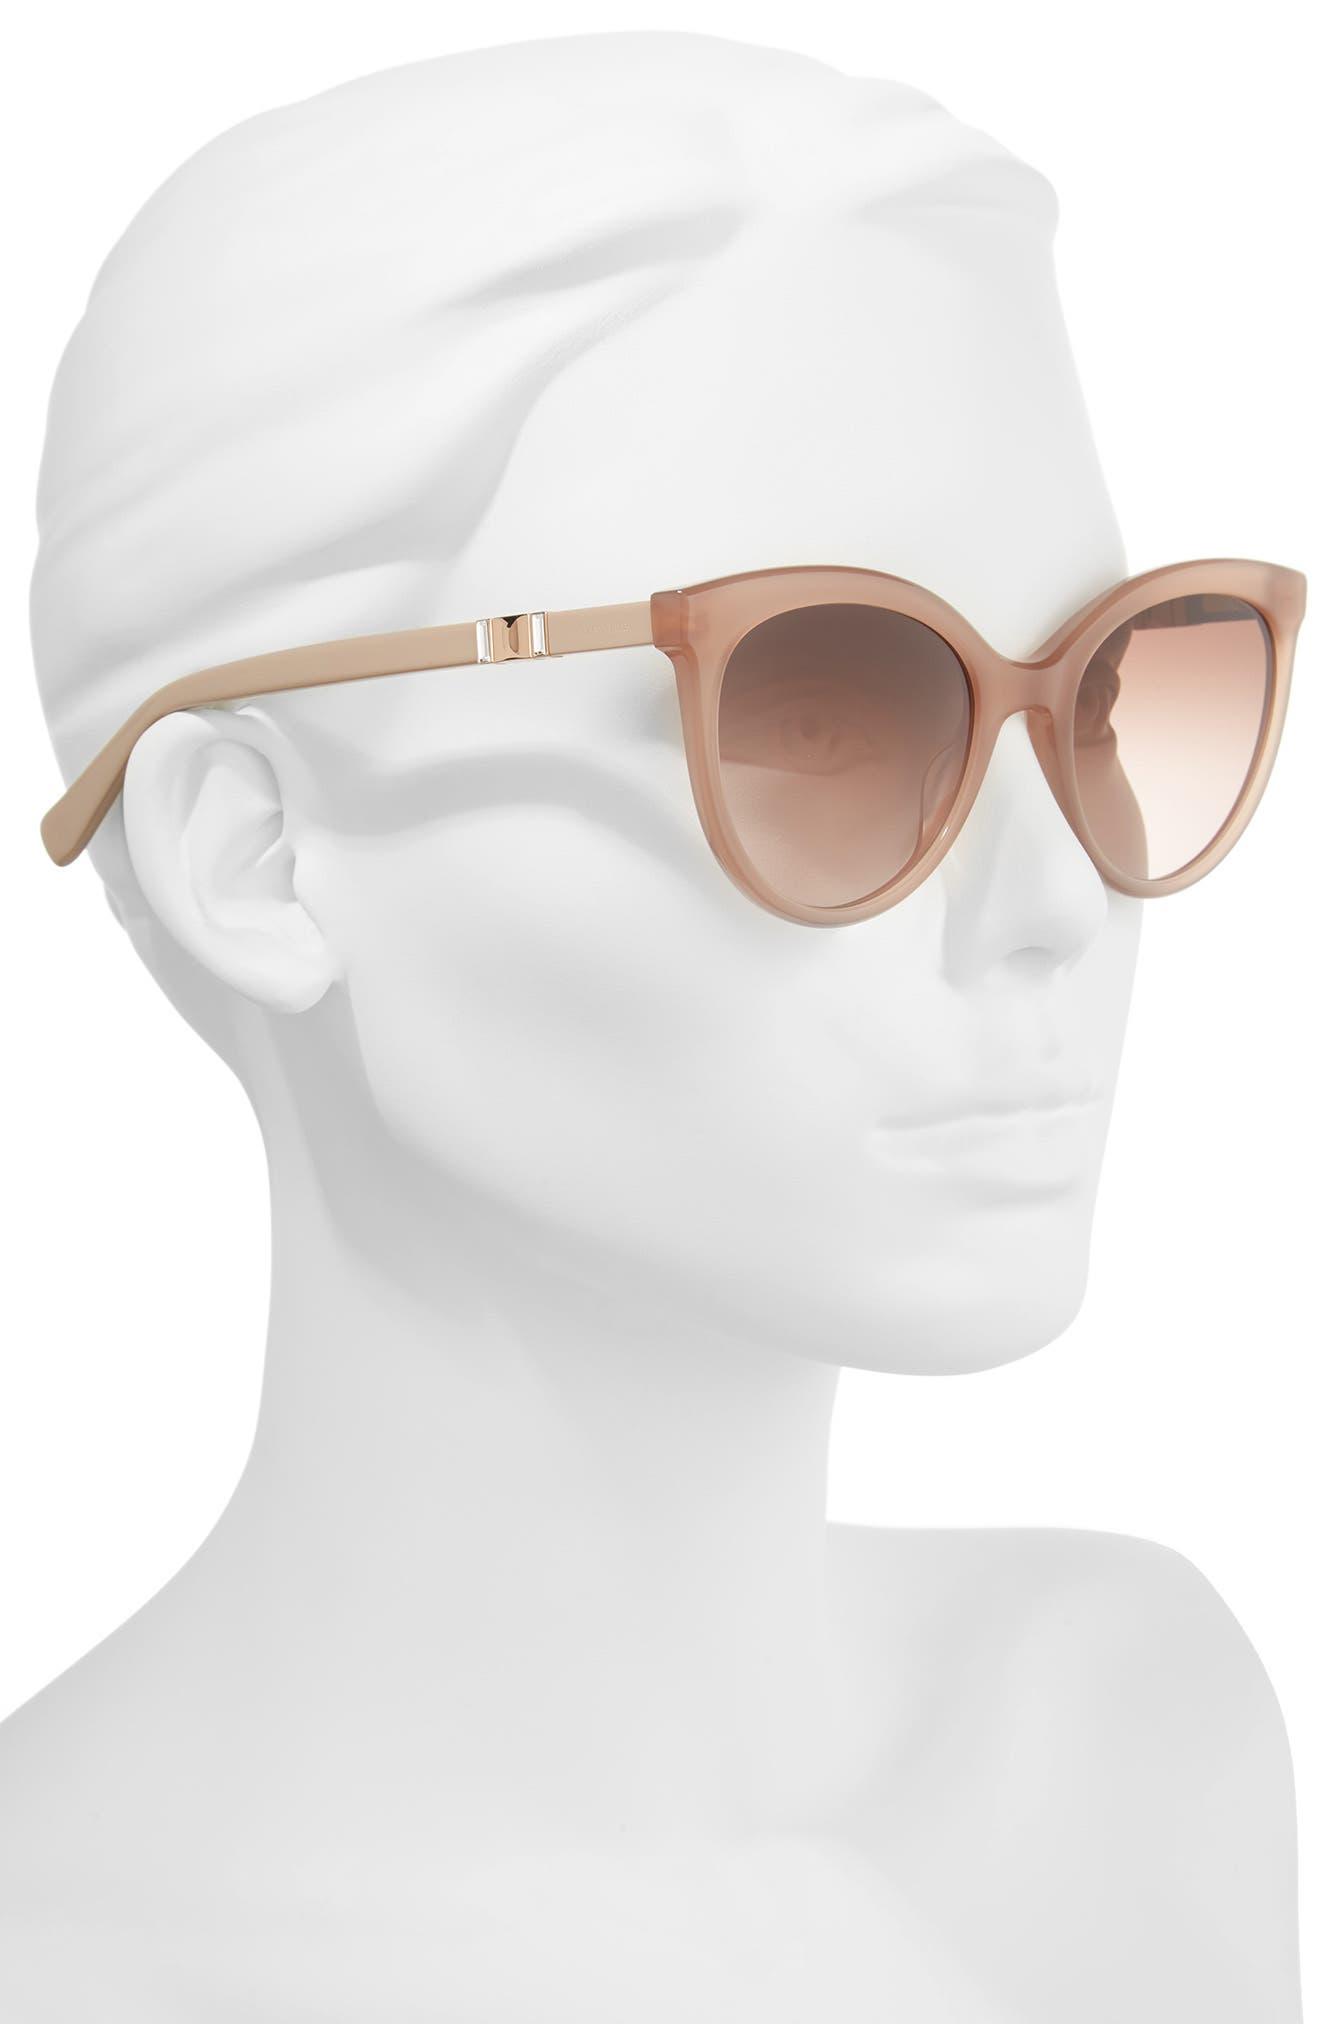 Jeweliis 54mm Gradient Cat Eye Sunglasses,                             Alternate thumbnail 2, color,                             NUDE